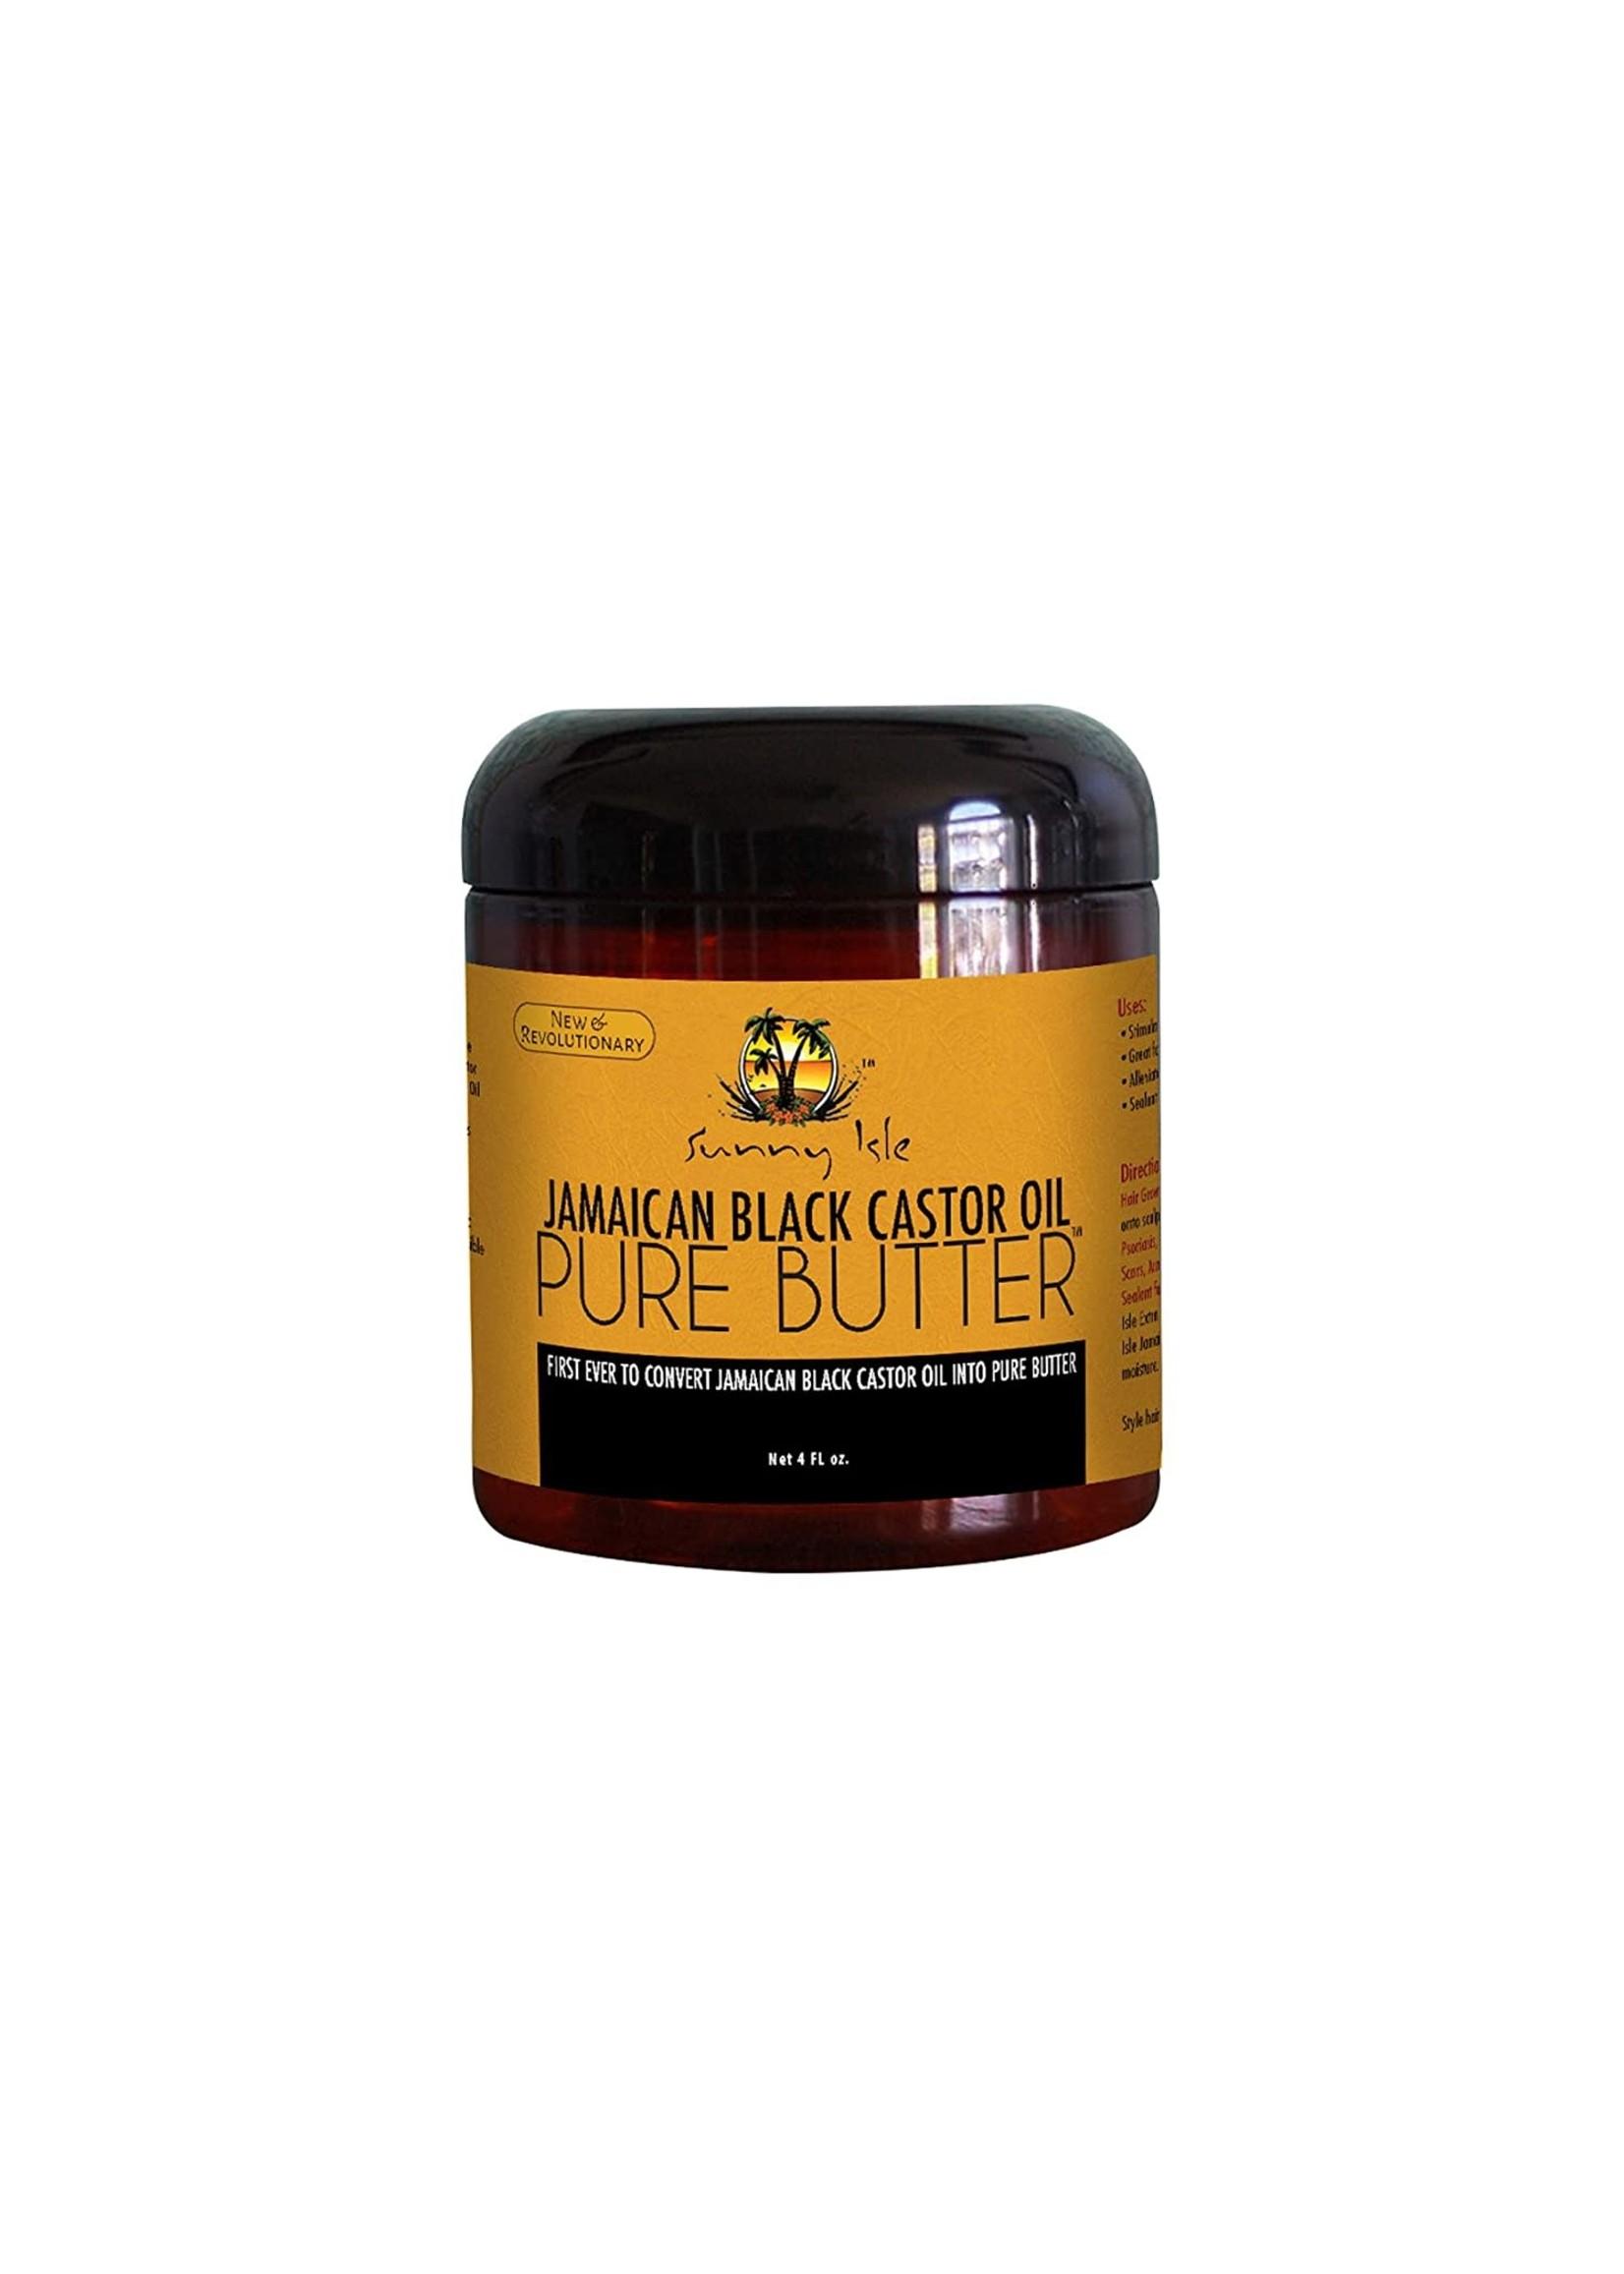 Jamaican Black Castor Oil PURE BUTTER